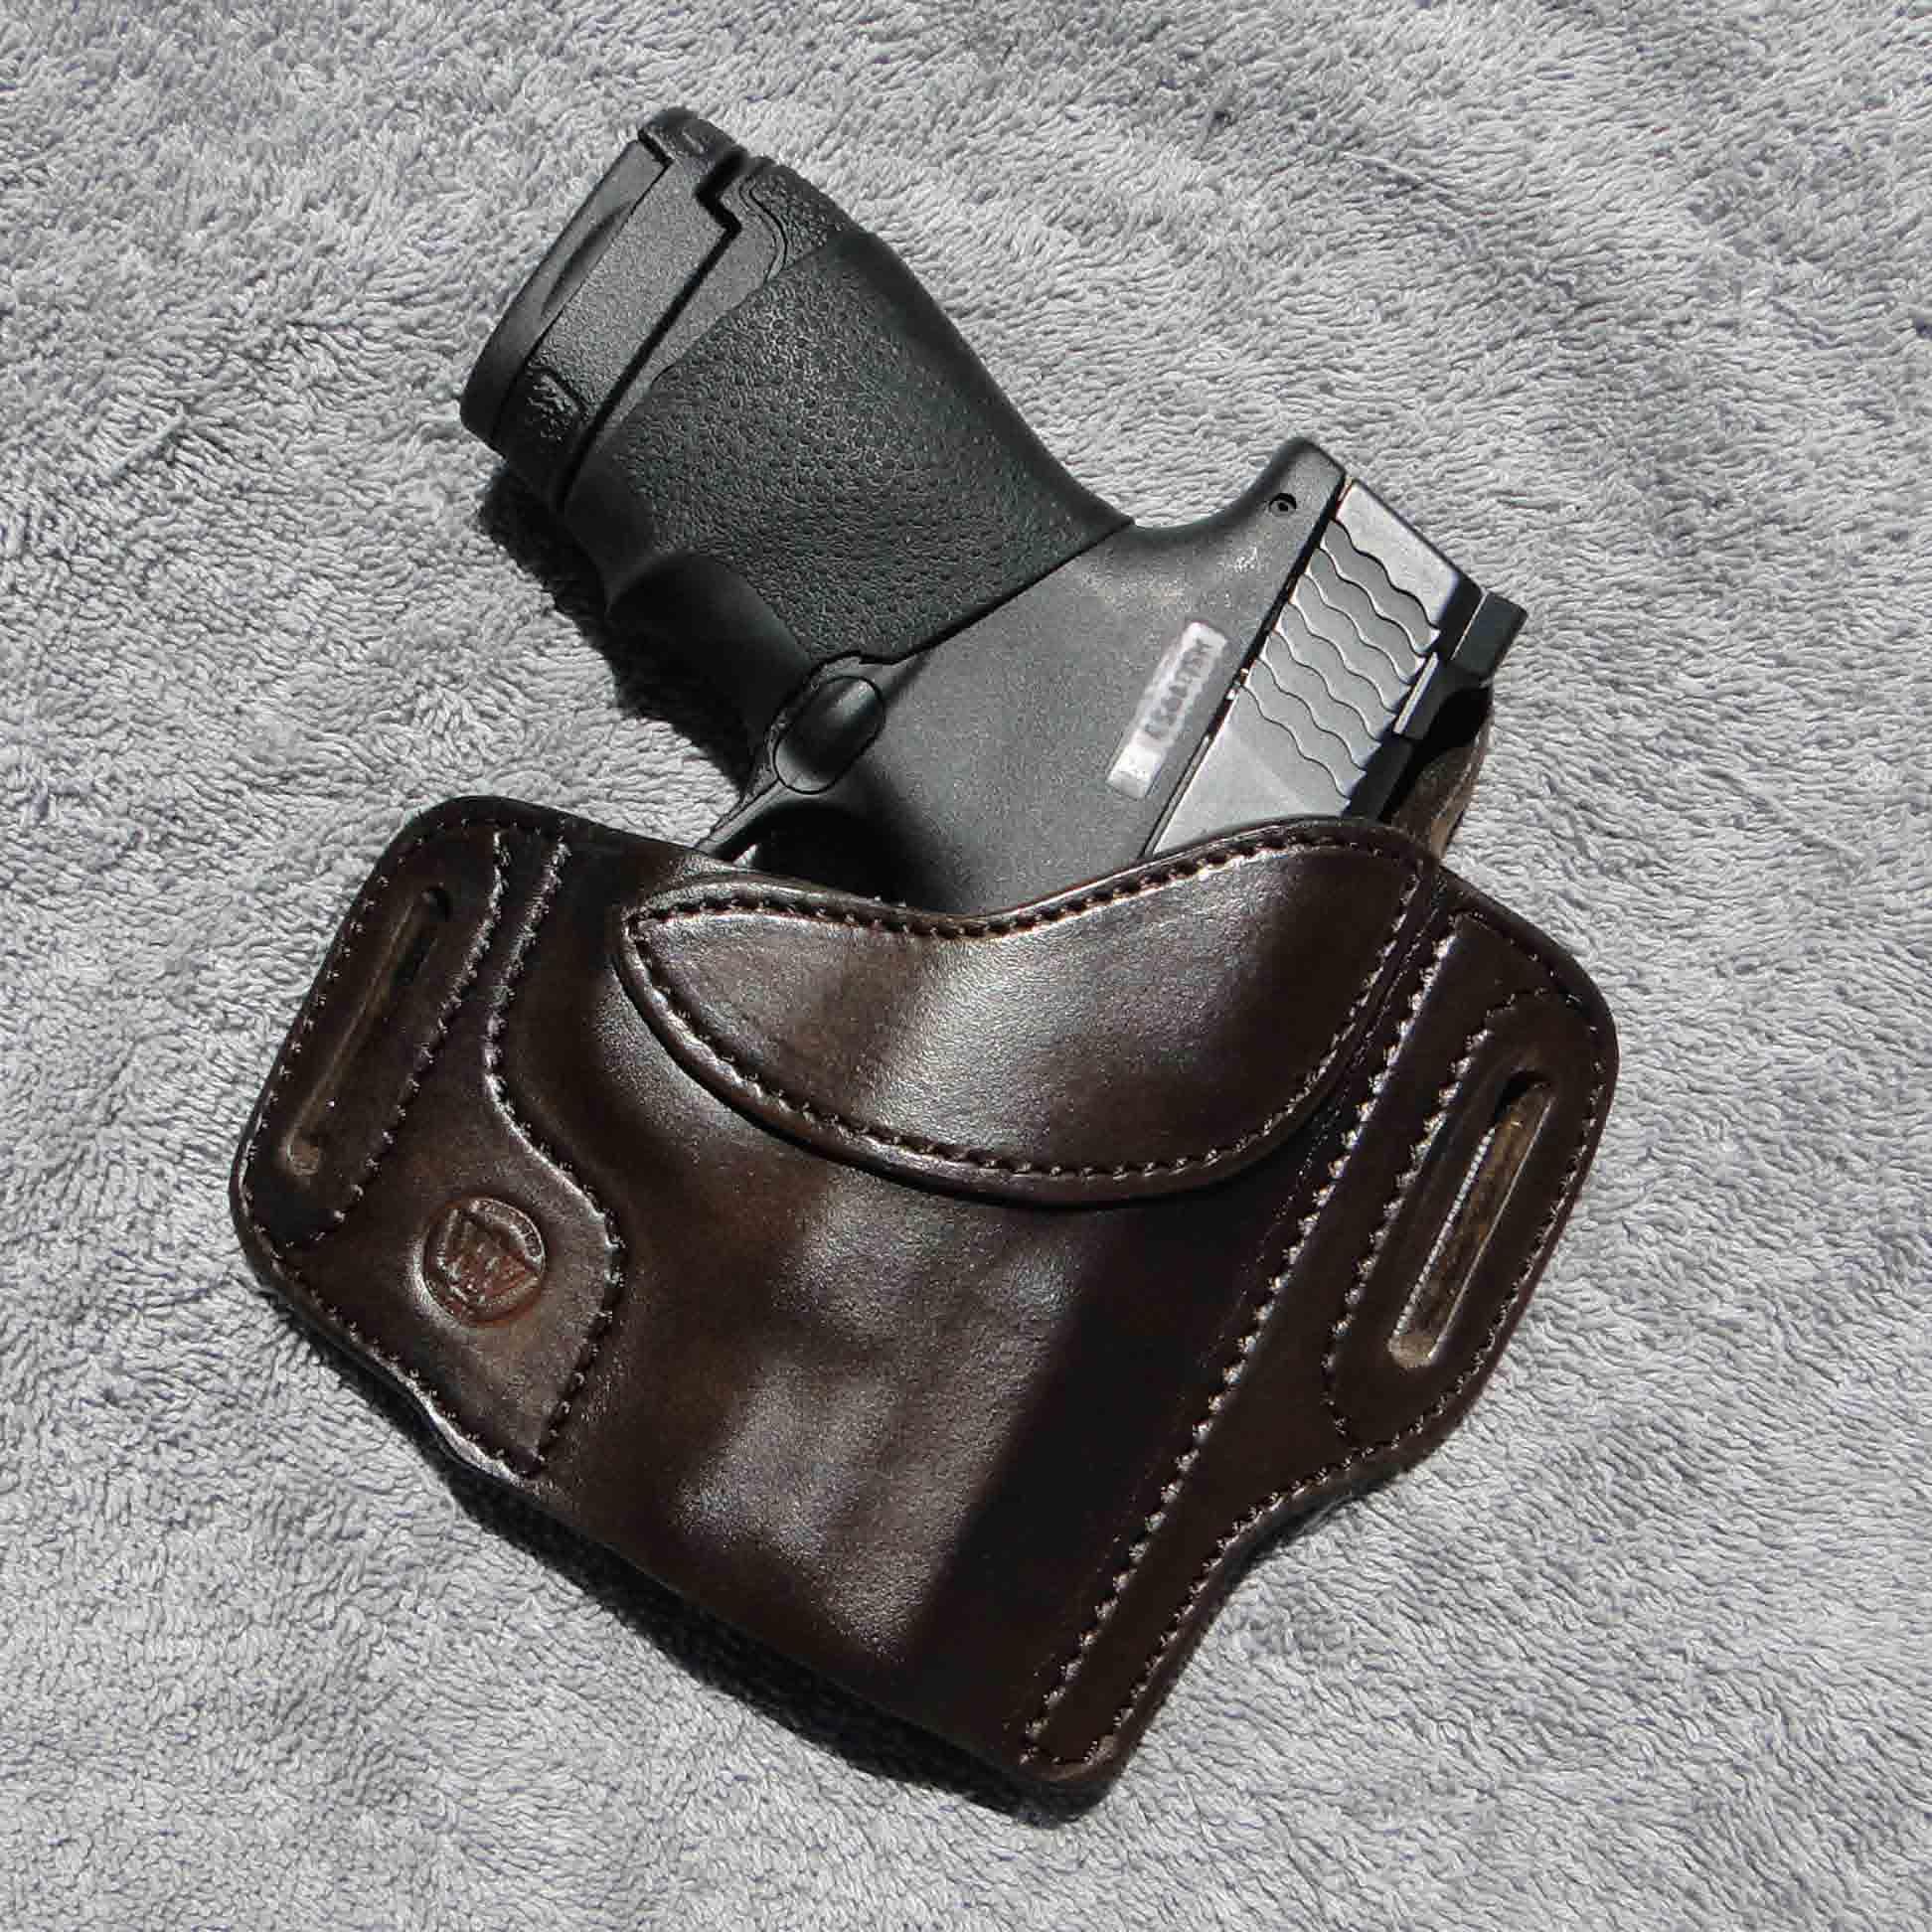 Glock 43 IWB/OWB dual-purpose holster